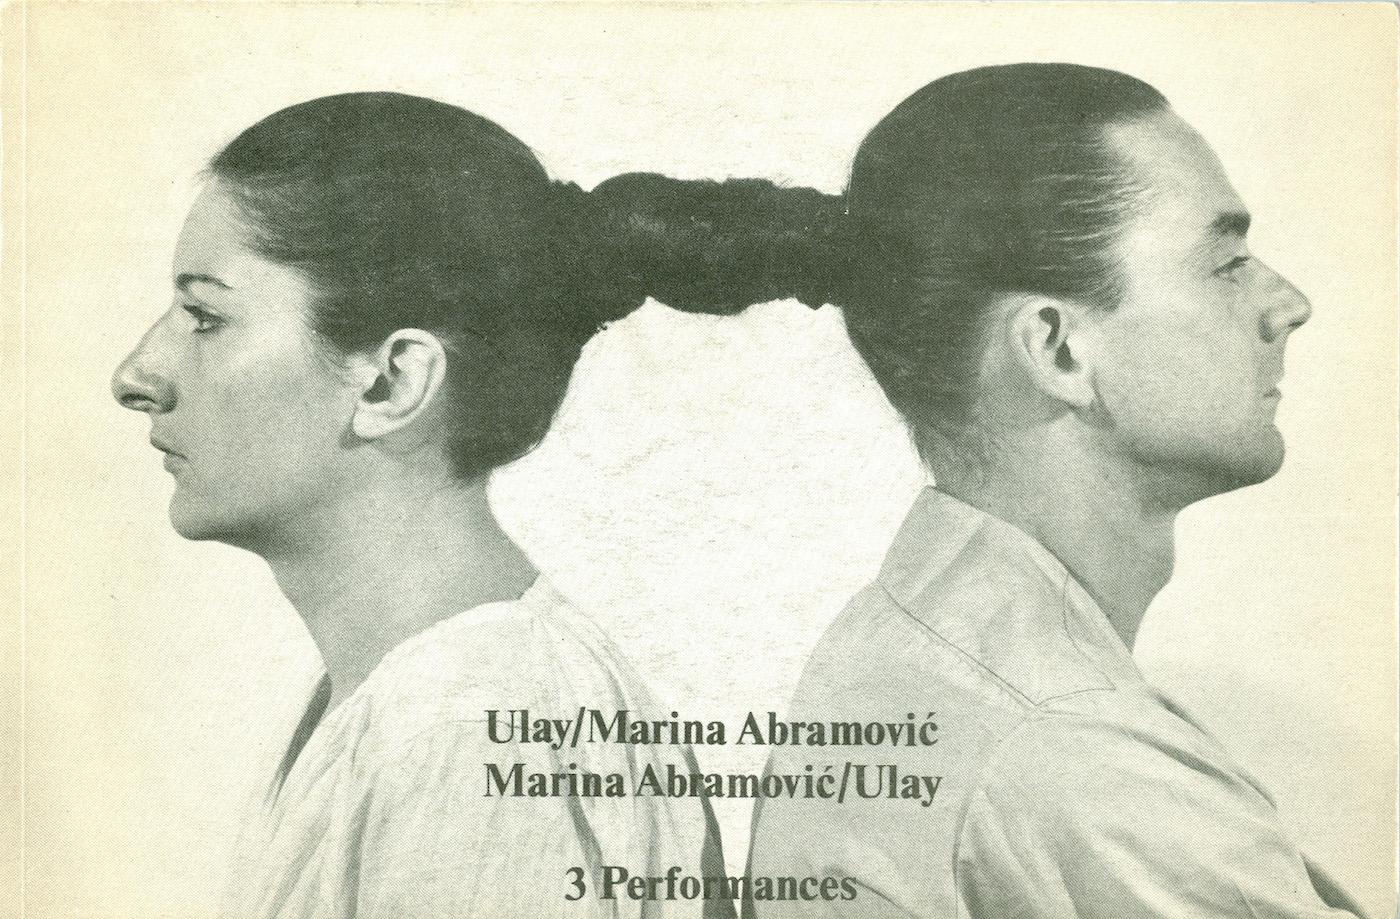 Artists' book by Marina Abramović and Ulay, via  Wikipedia